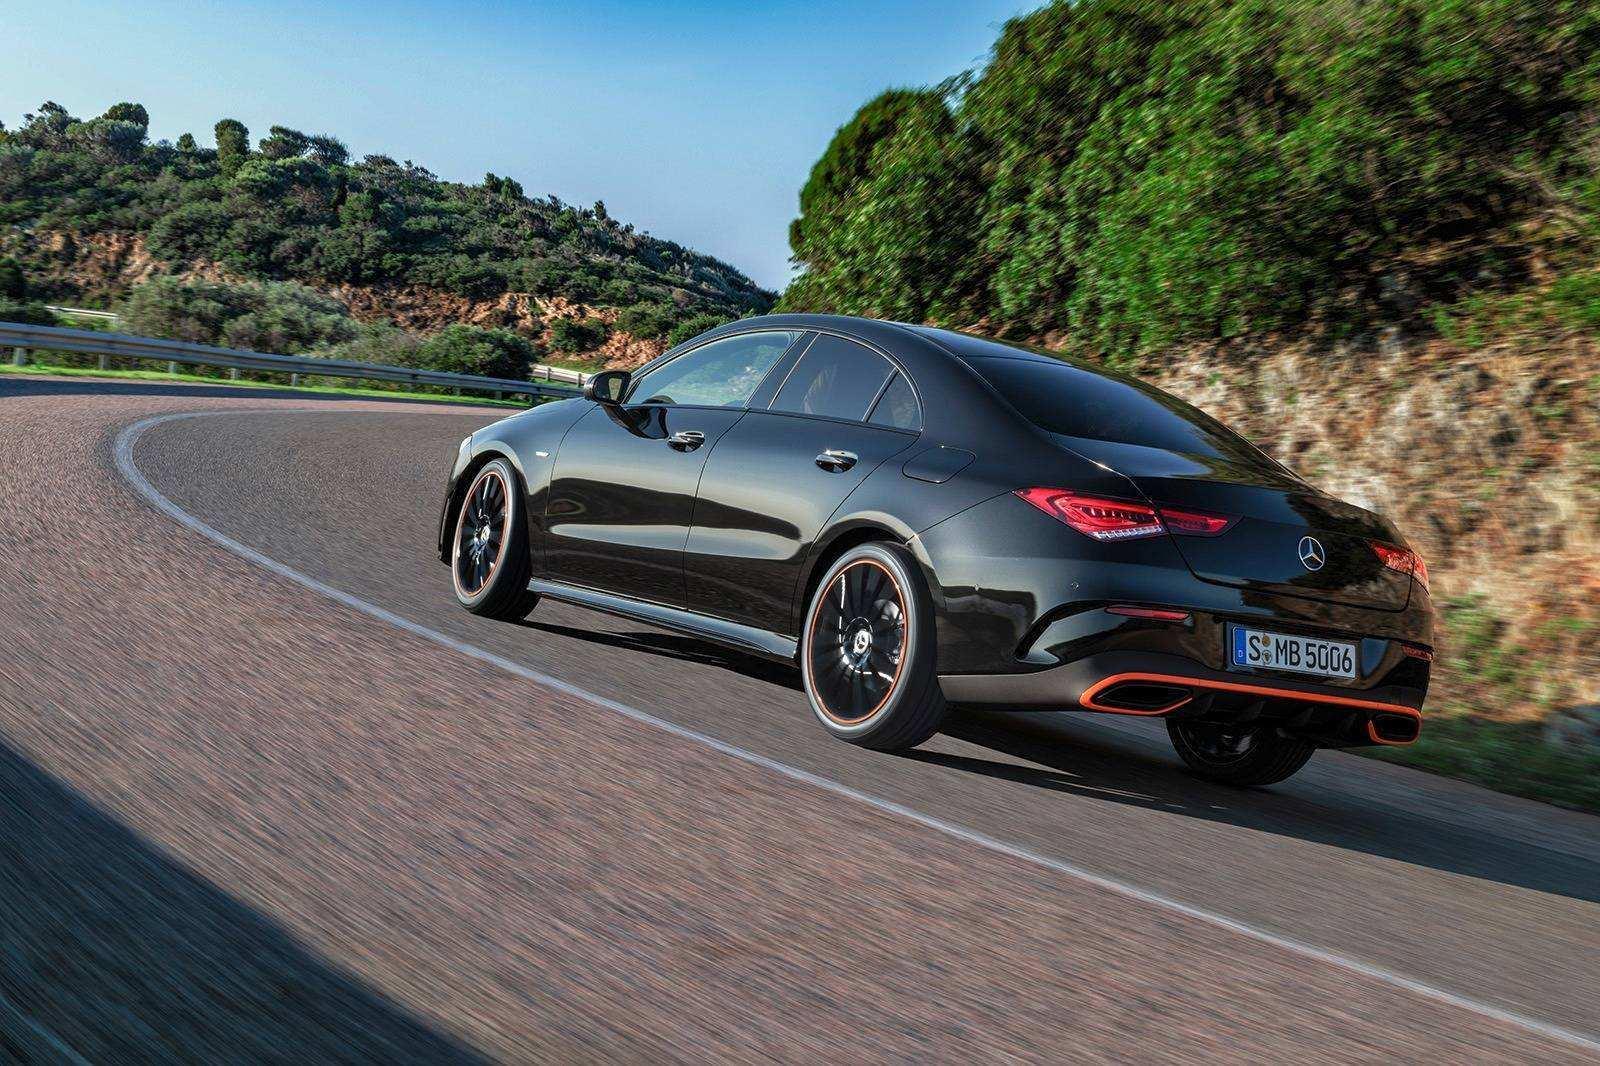 36 Great Mercedes Cla 2019 Release Date Release Date by Mercedes Cla 2019 Release Date